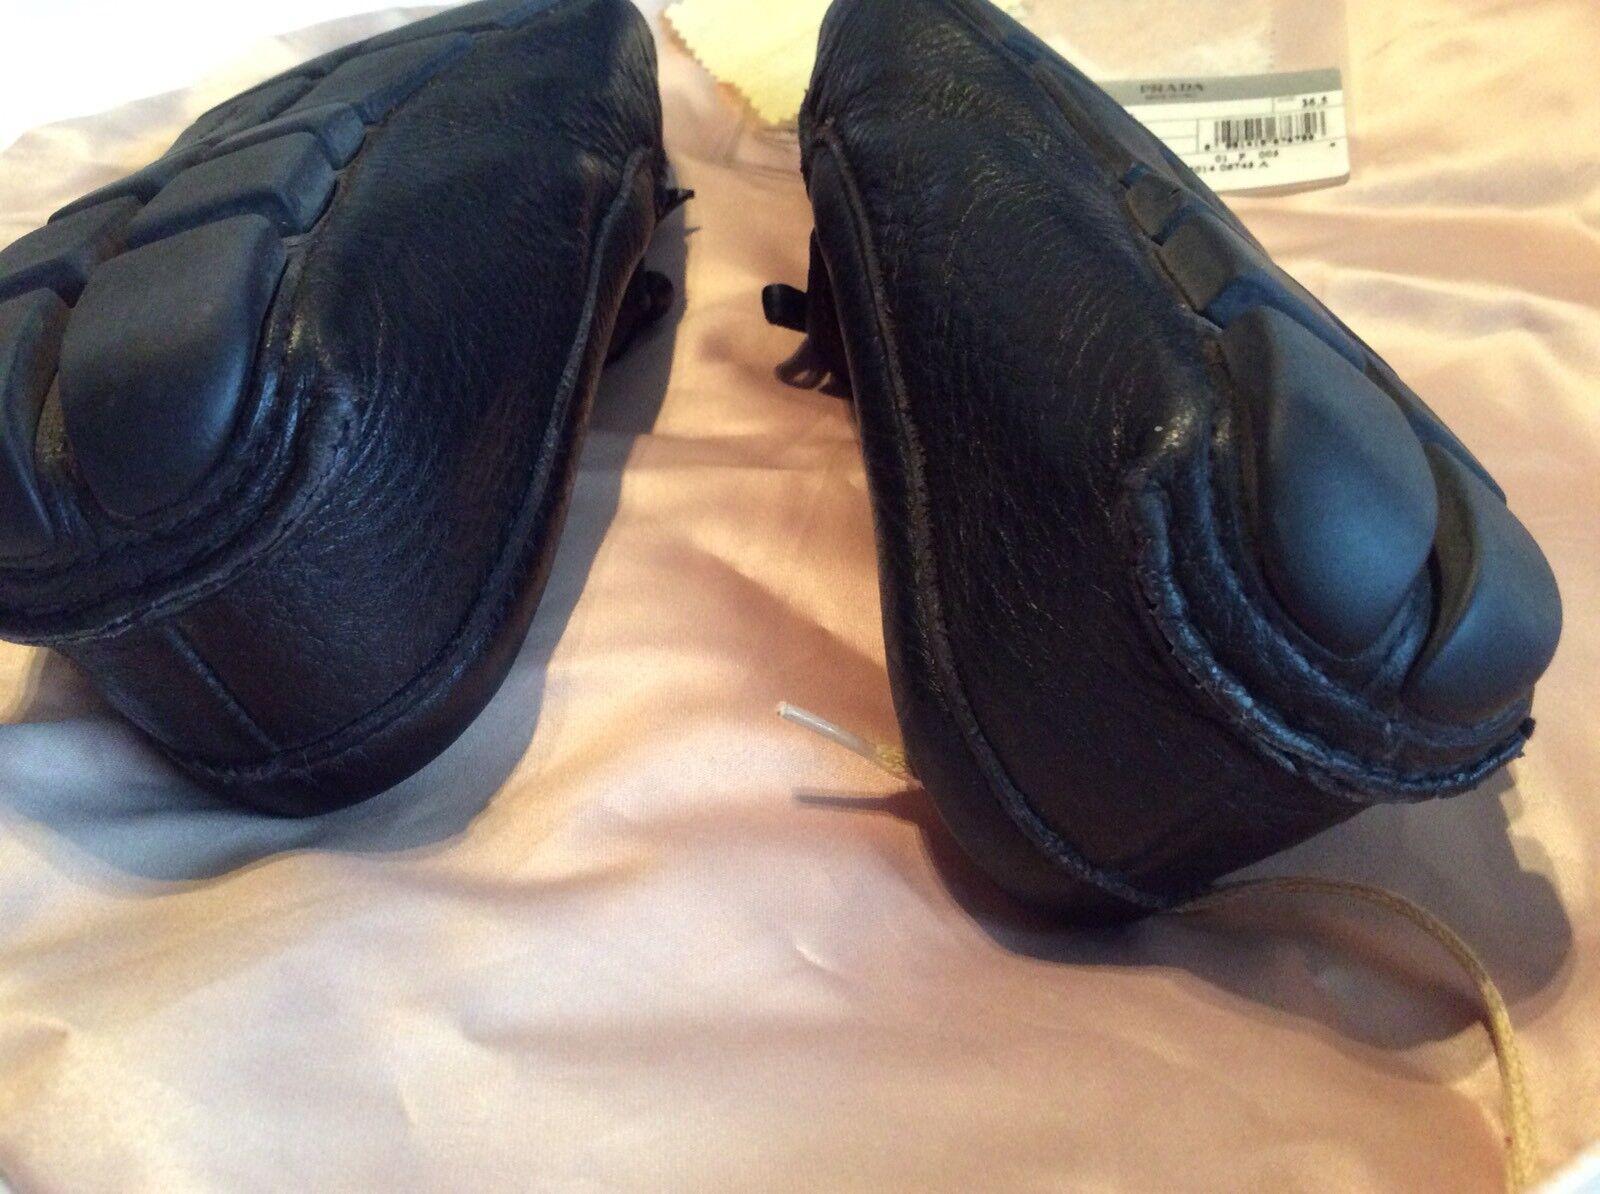 Prada Driving shoes - Black - Size Size Size 36.5  PRADA UK SIZE 3.5 Driving shoes 9e4767